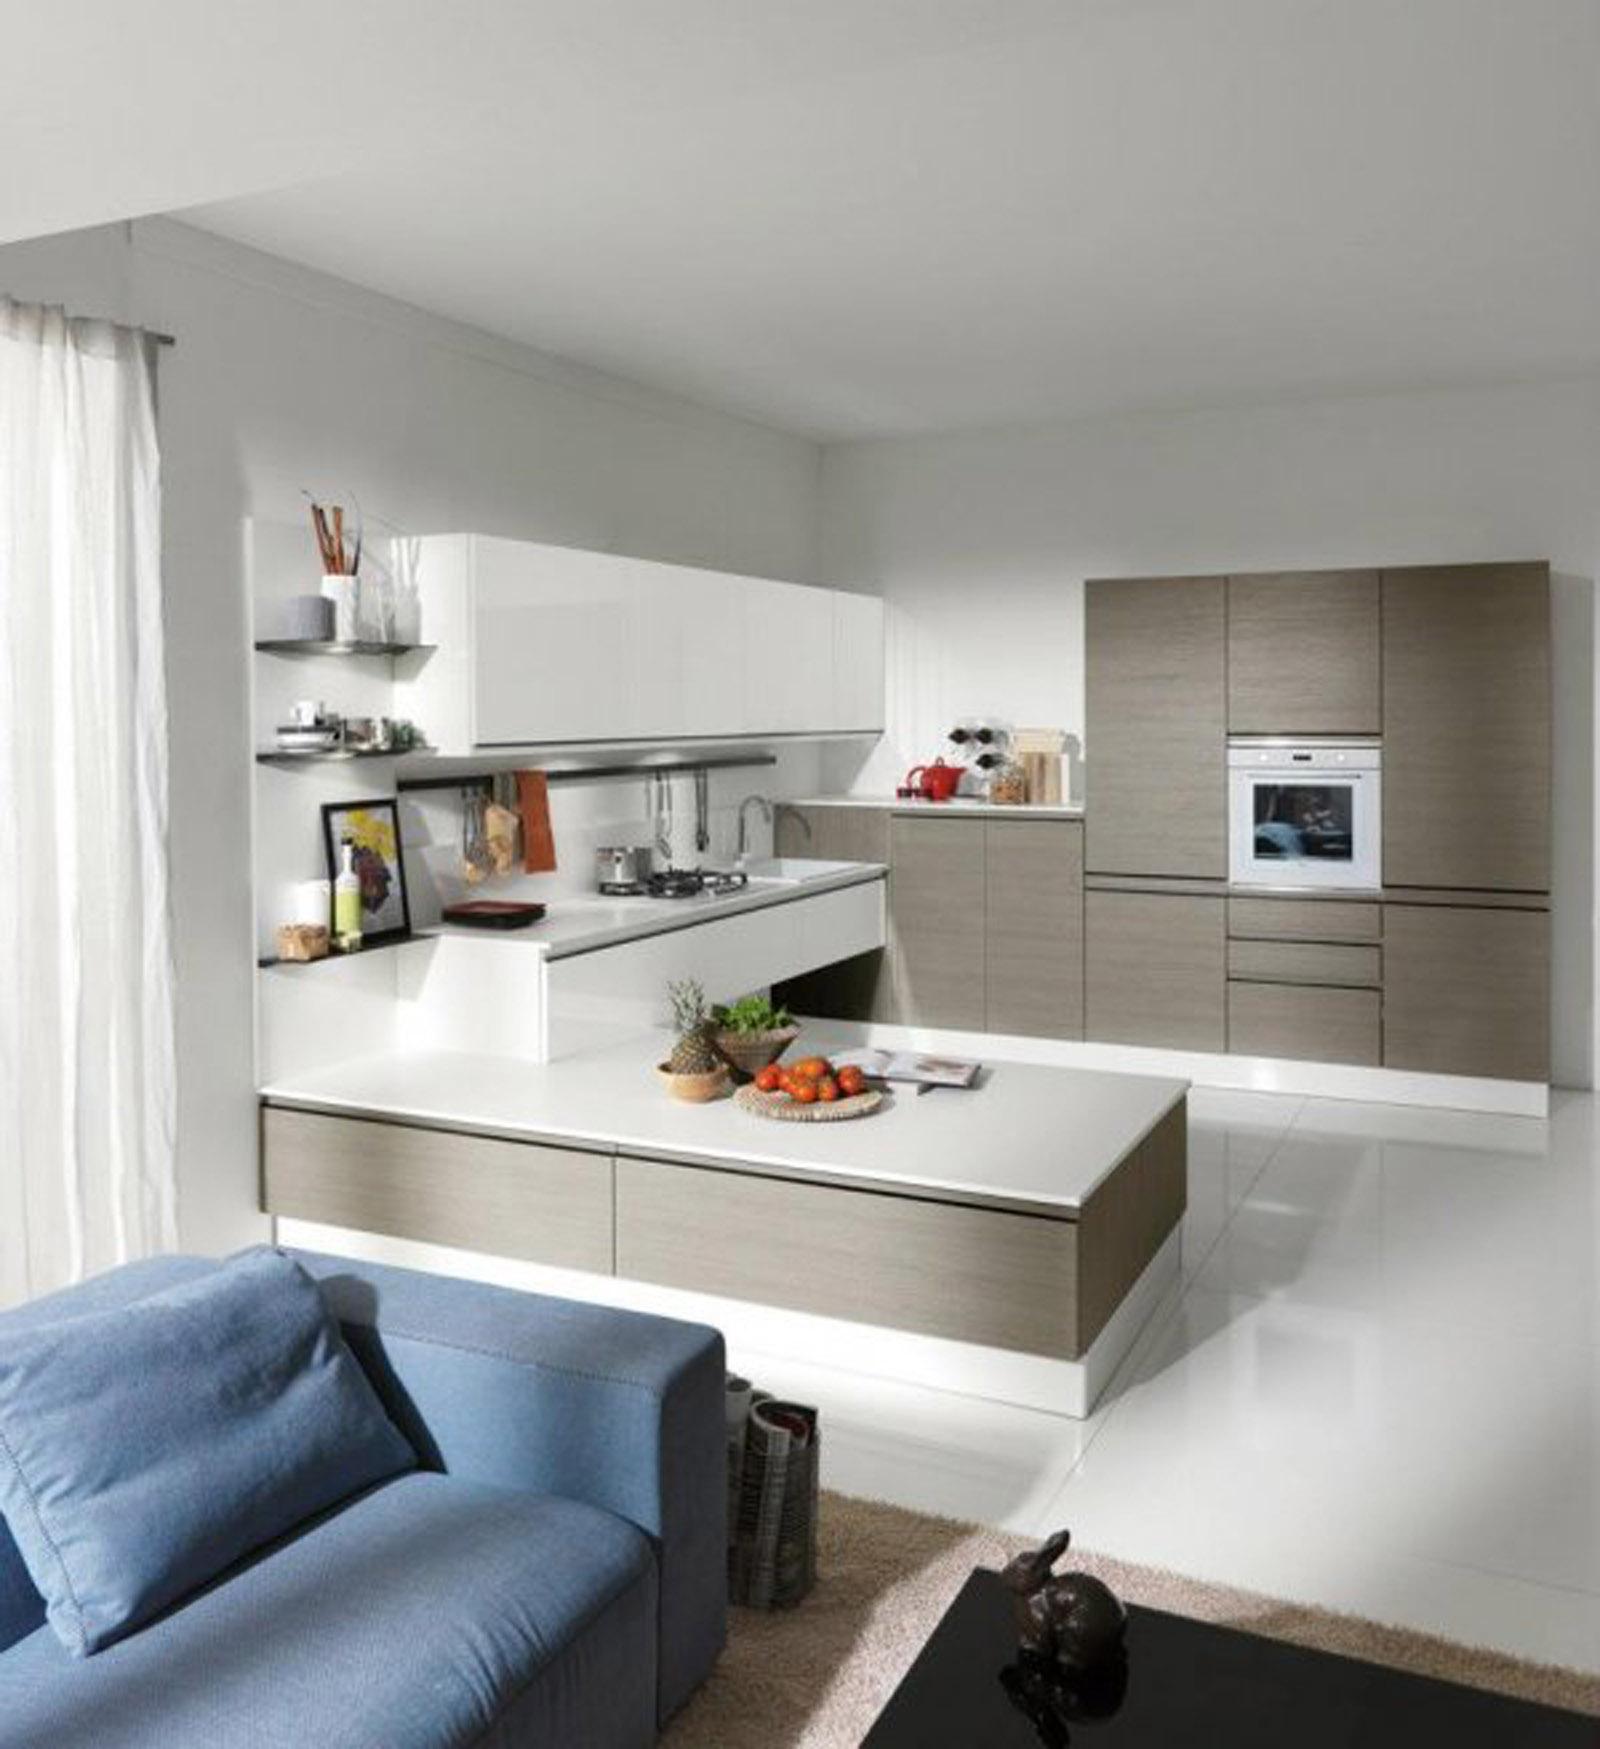 Idee per arredare una cucina a vista Sicilia,Catania,Messina,Enna ...